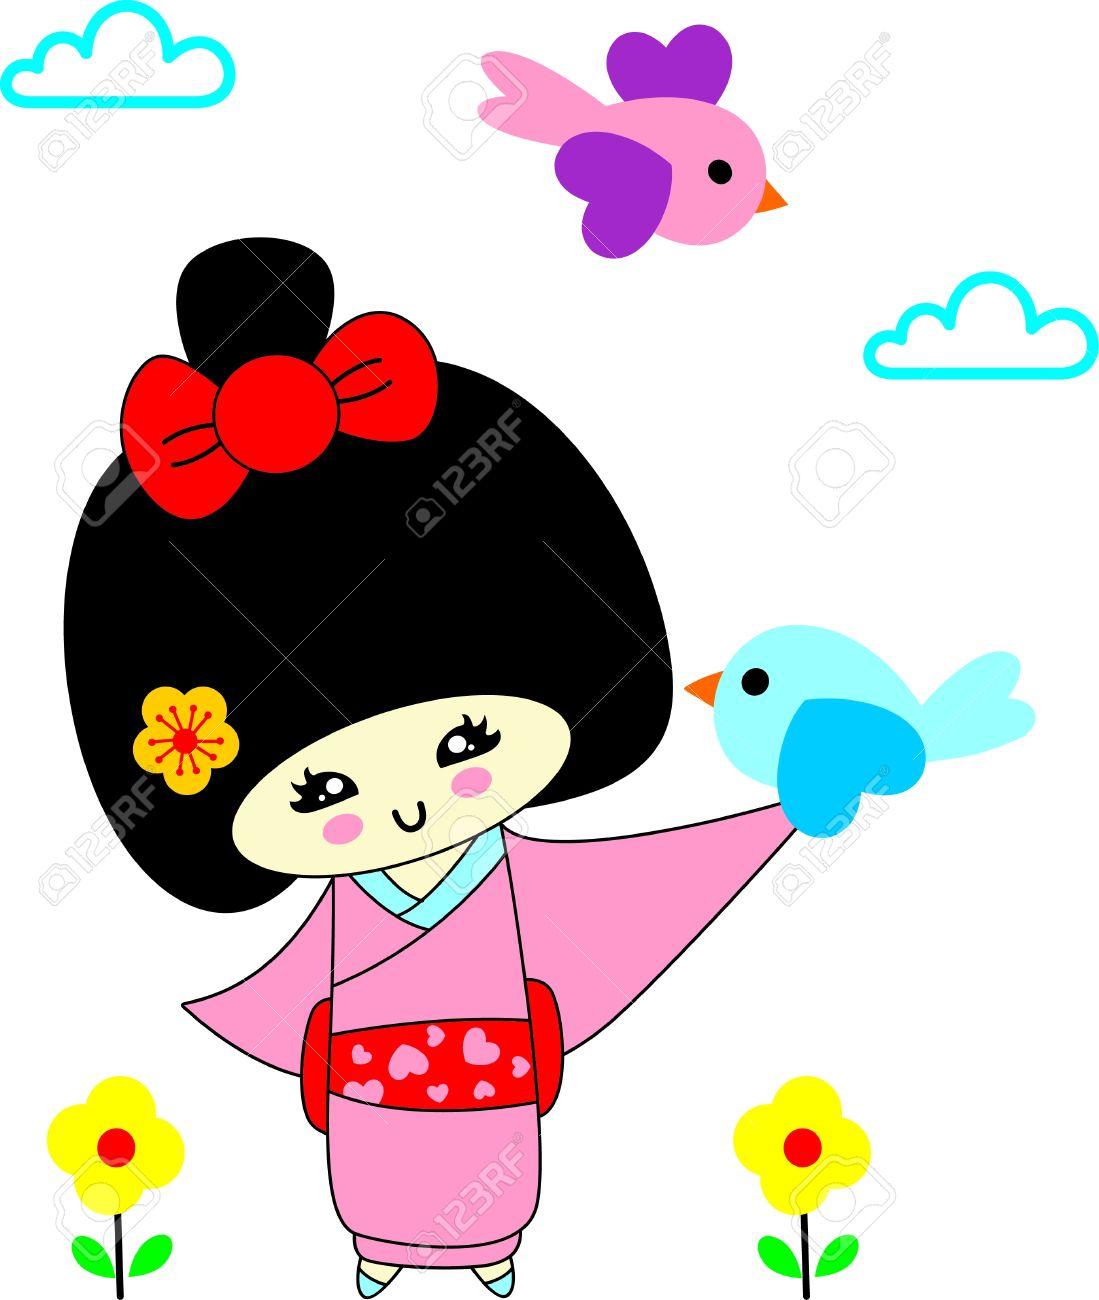 hight resolution of 1099x1300 japanese cartoon clipart